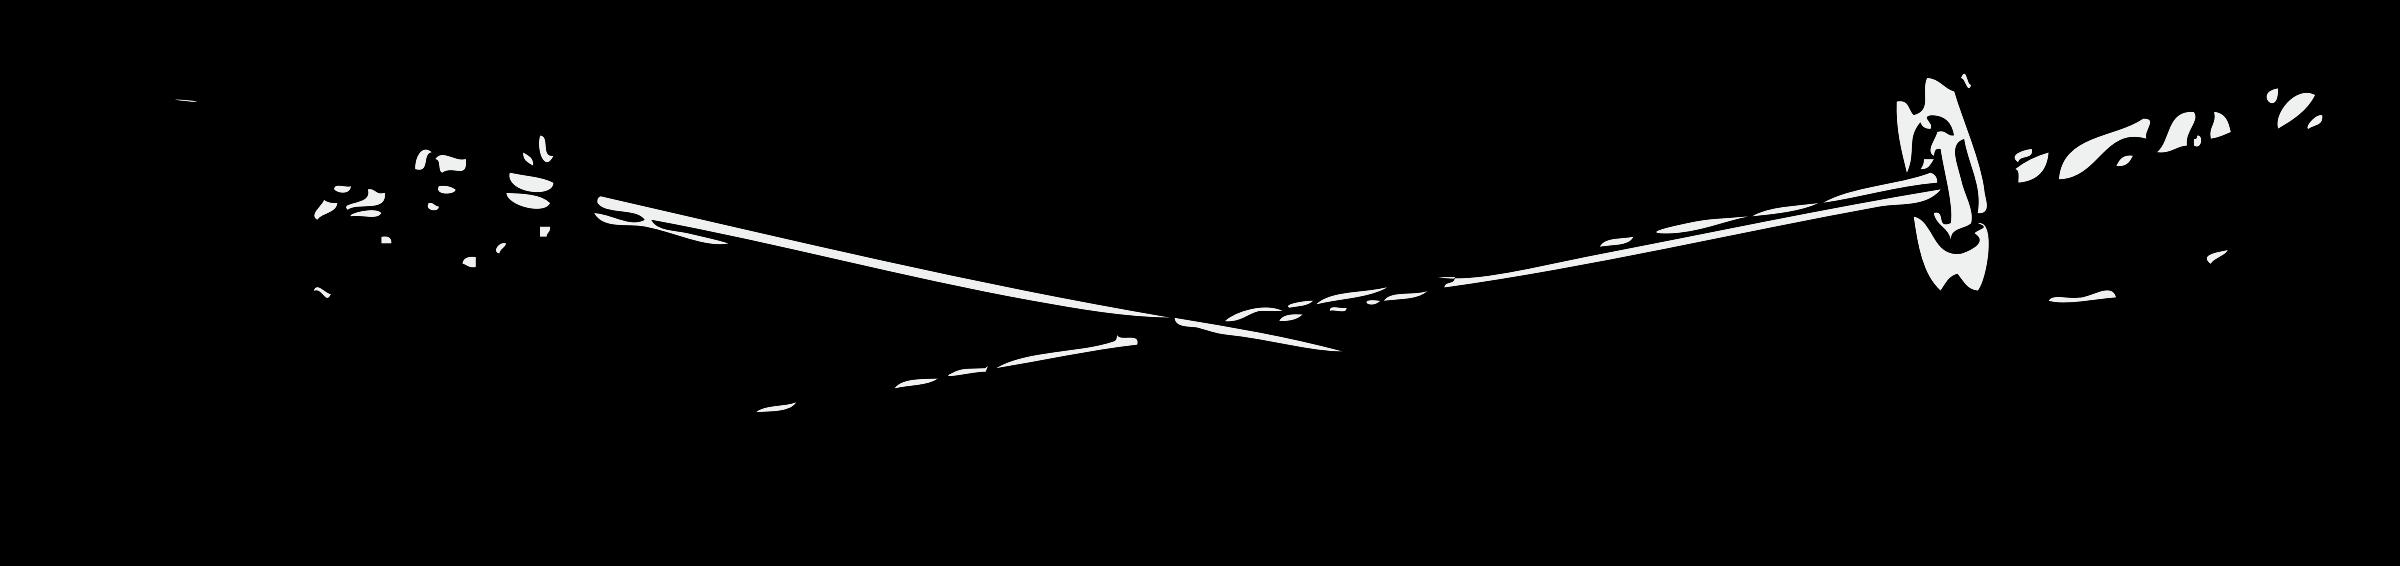 Clipart Crossed Swords Sword Family Event Clip Art